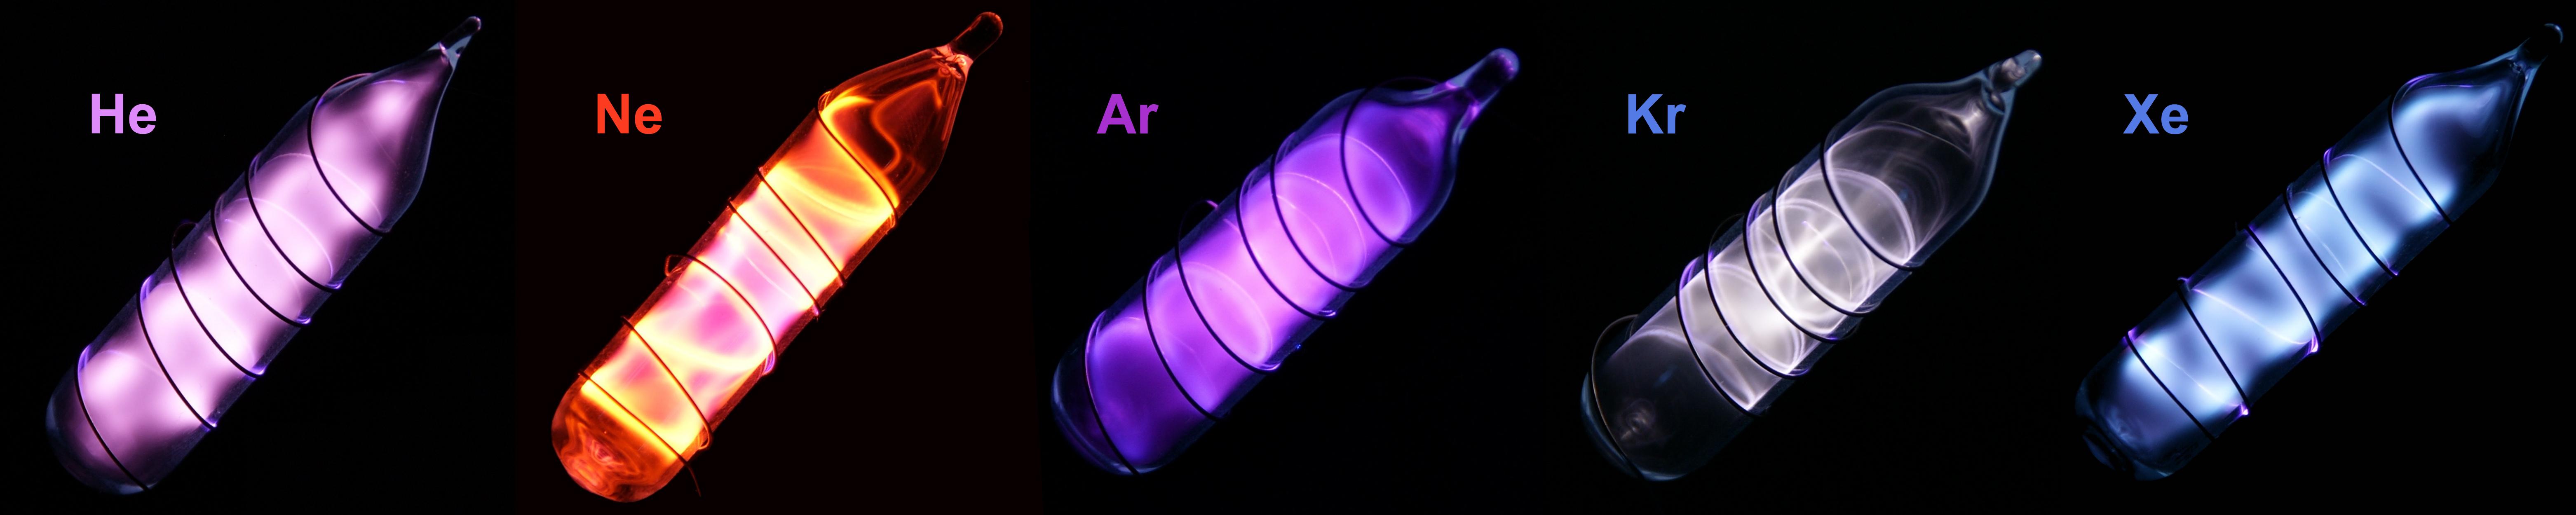 argon lamp photo - 4